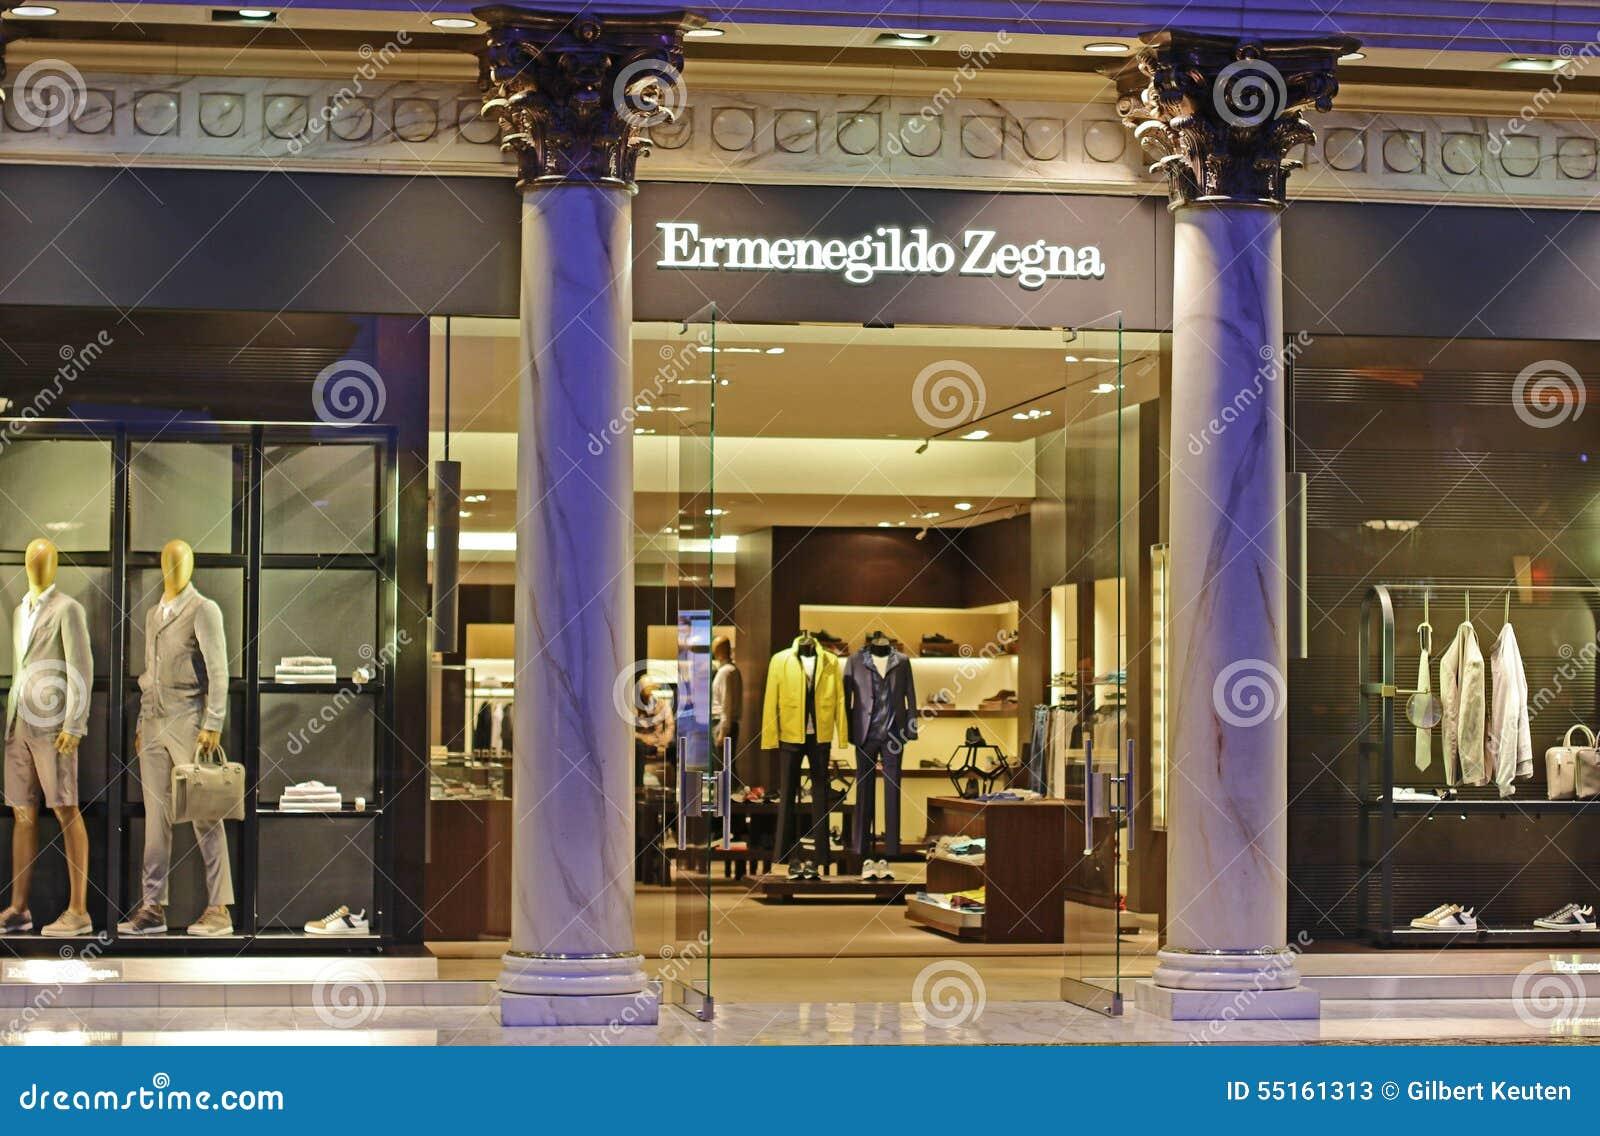 2a75a8f5a1a Ermenegildo Zegna Store Stock Images - Download 74 Royalty Free Photos